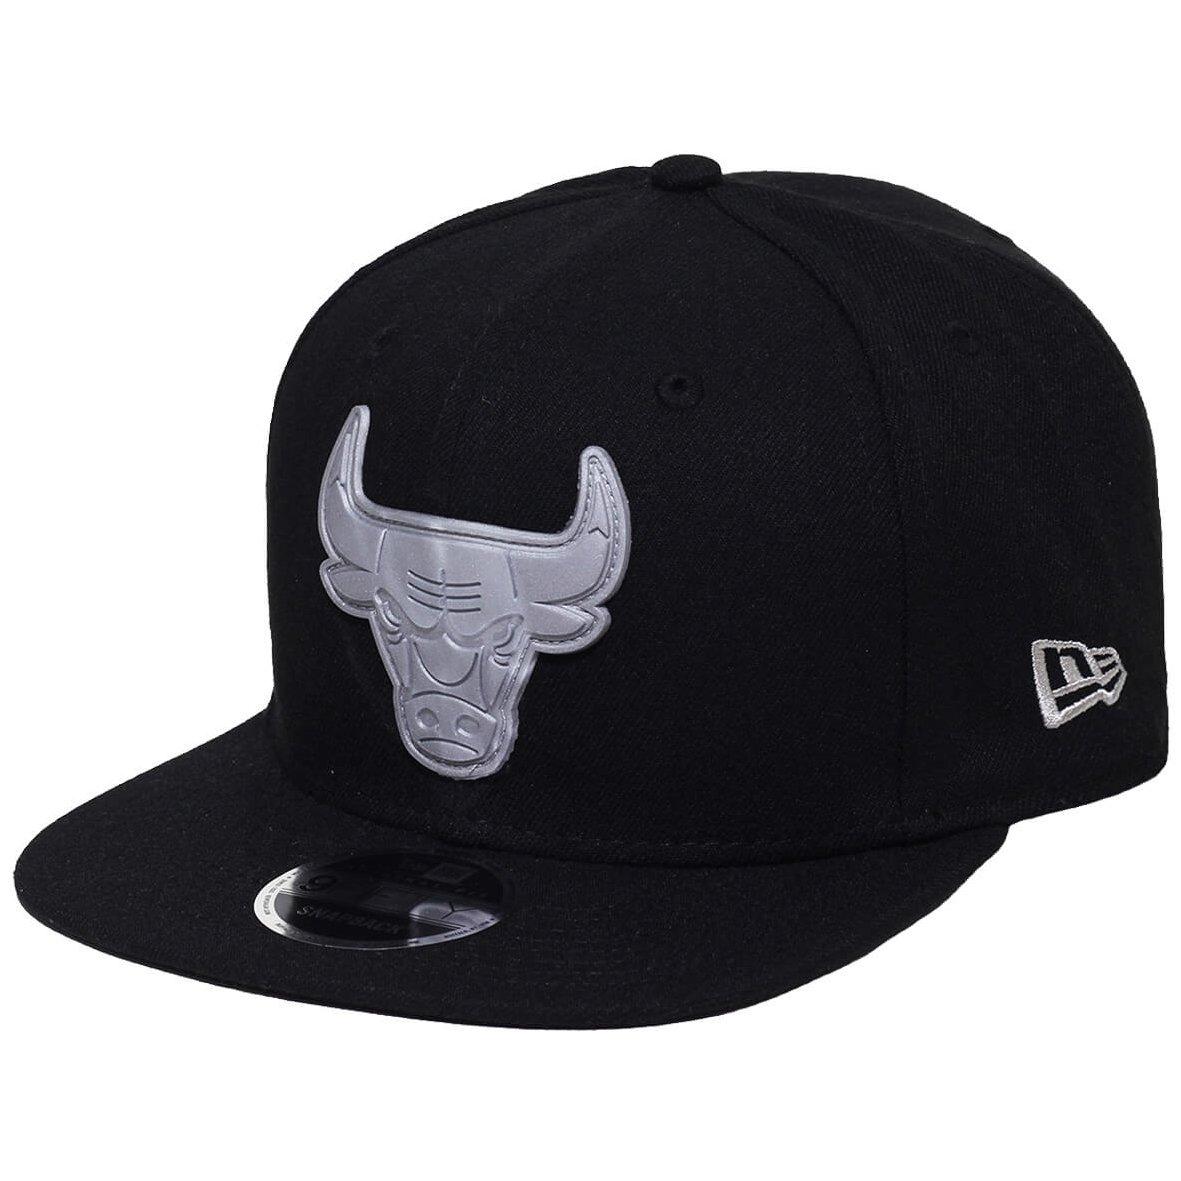 Boné New Era Aba Reta Snapback Nba Chicago Bulls R - Compre Agora ... b08f019ba57